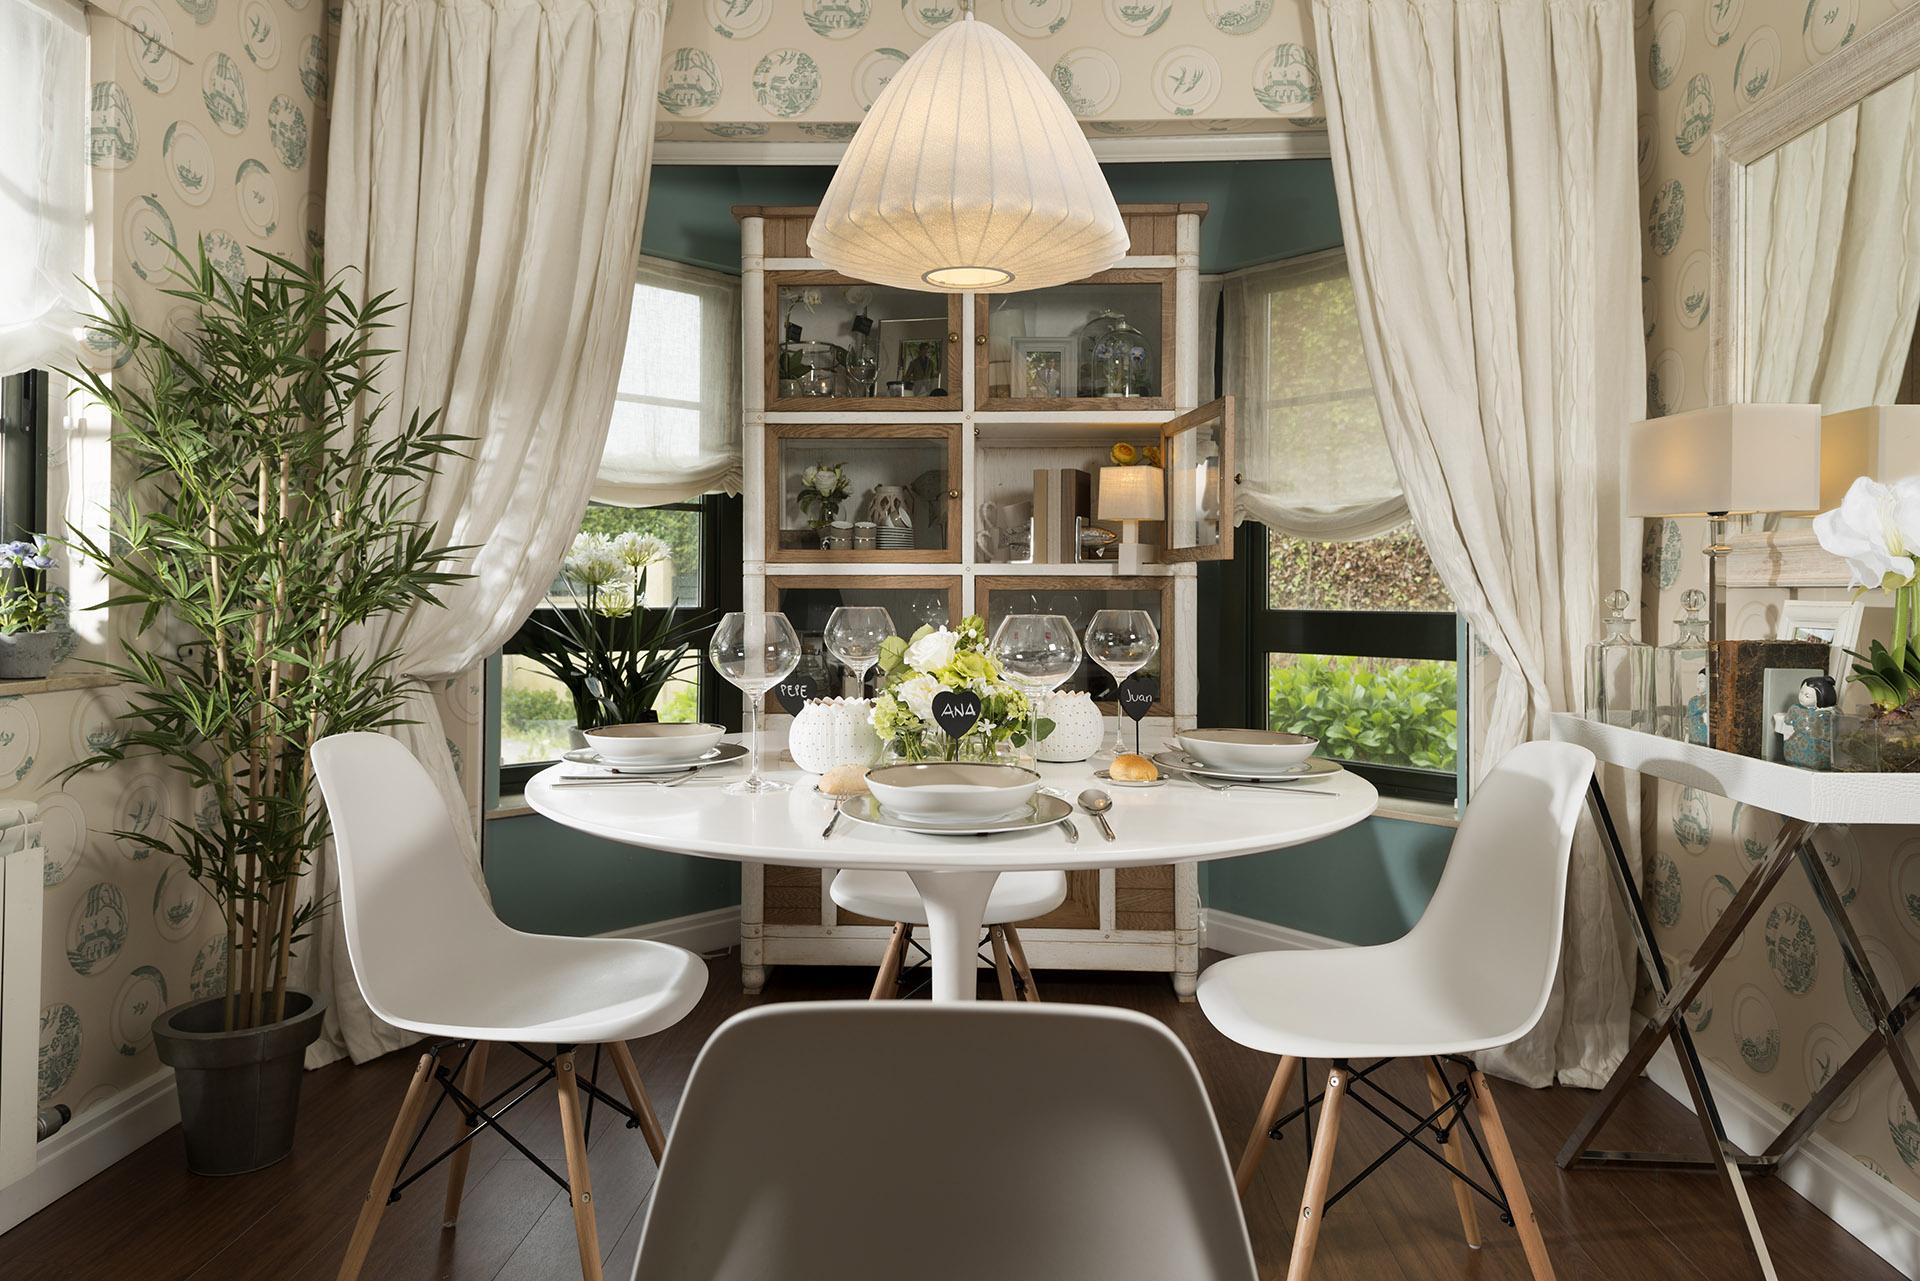 KdK Interior Design : 3